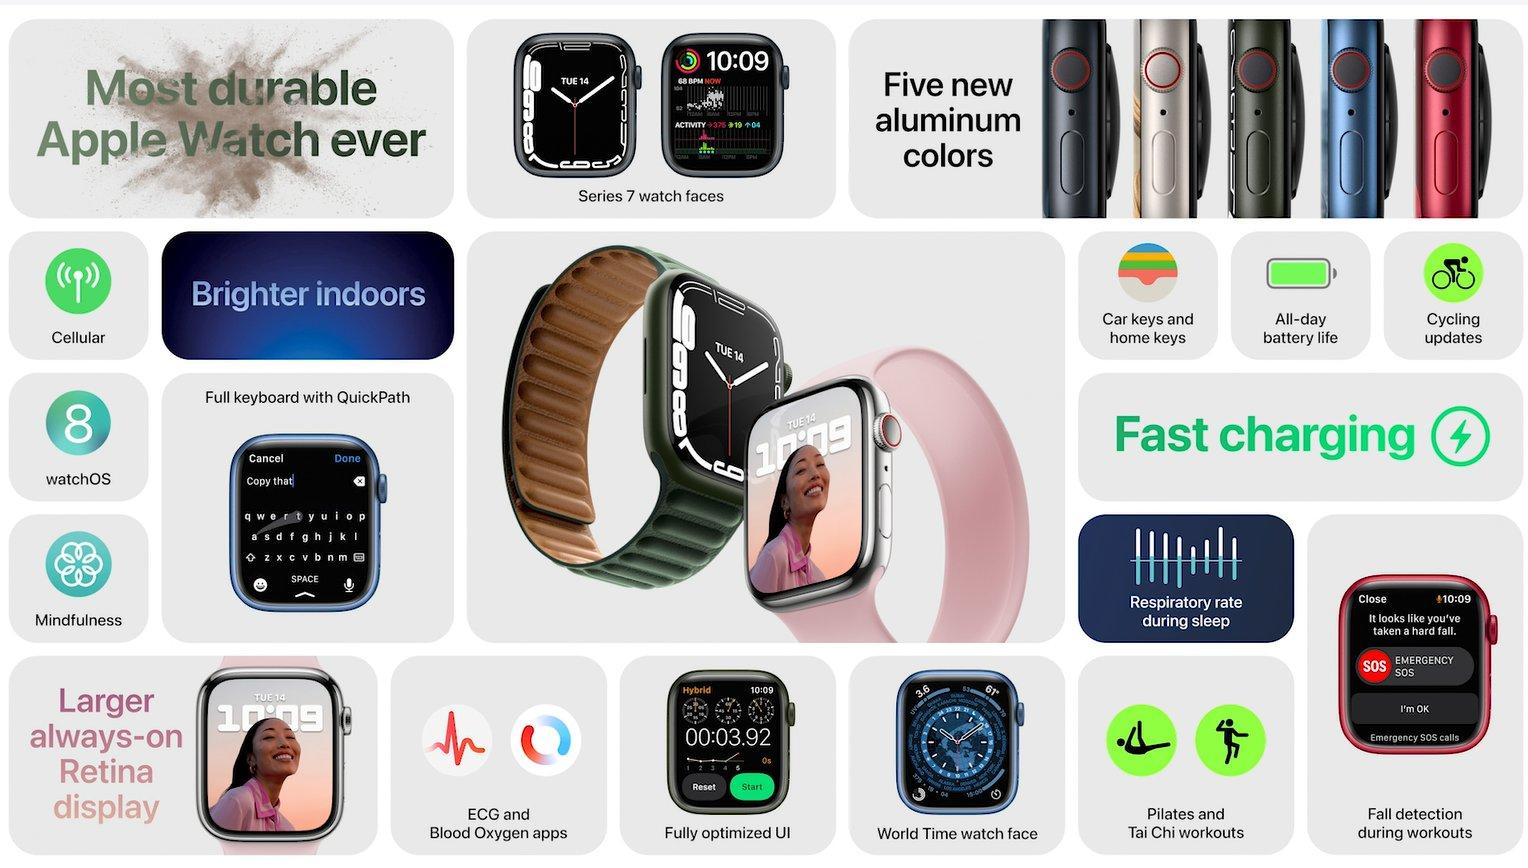 E Qz o5VkAEtLCp?format=jpg&name=large - Apple announces Apple Watch Series 7